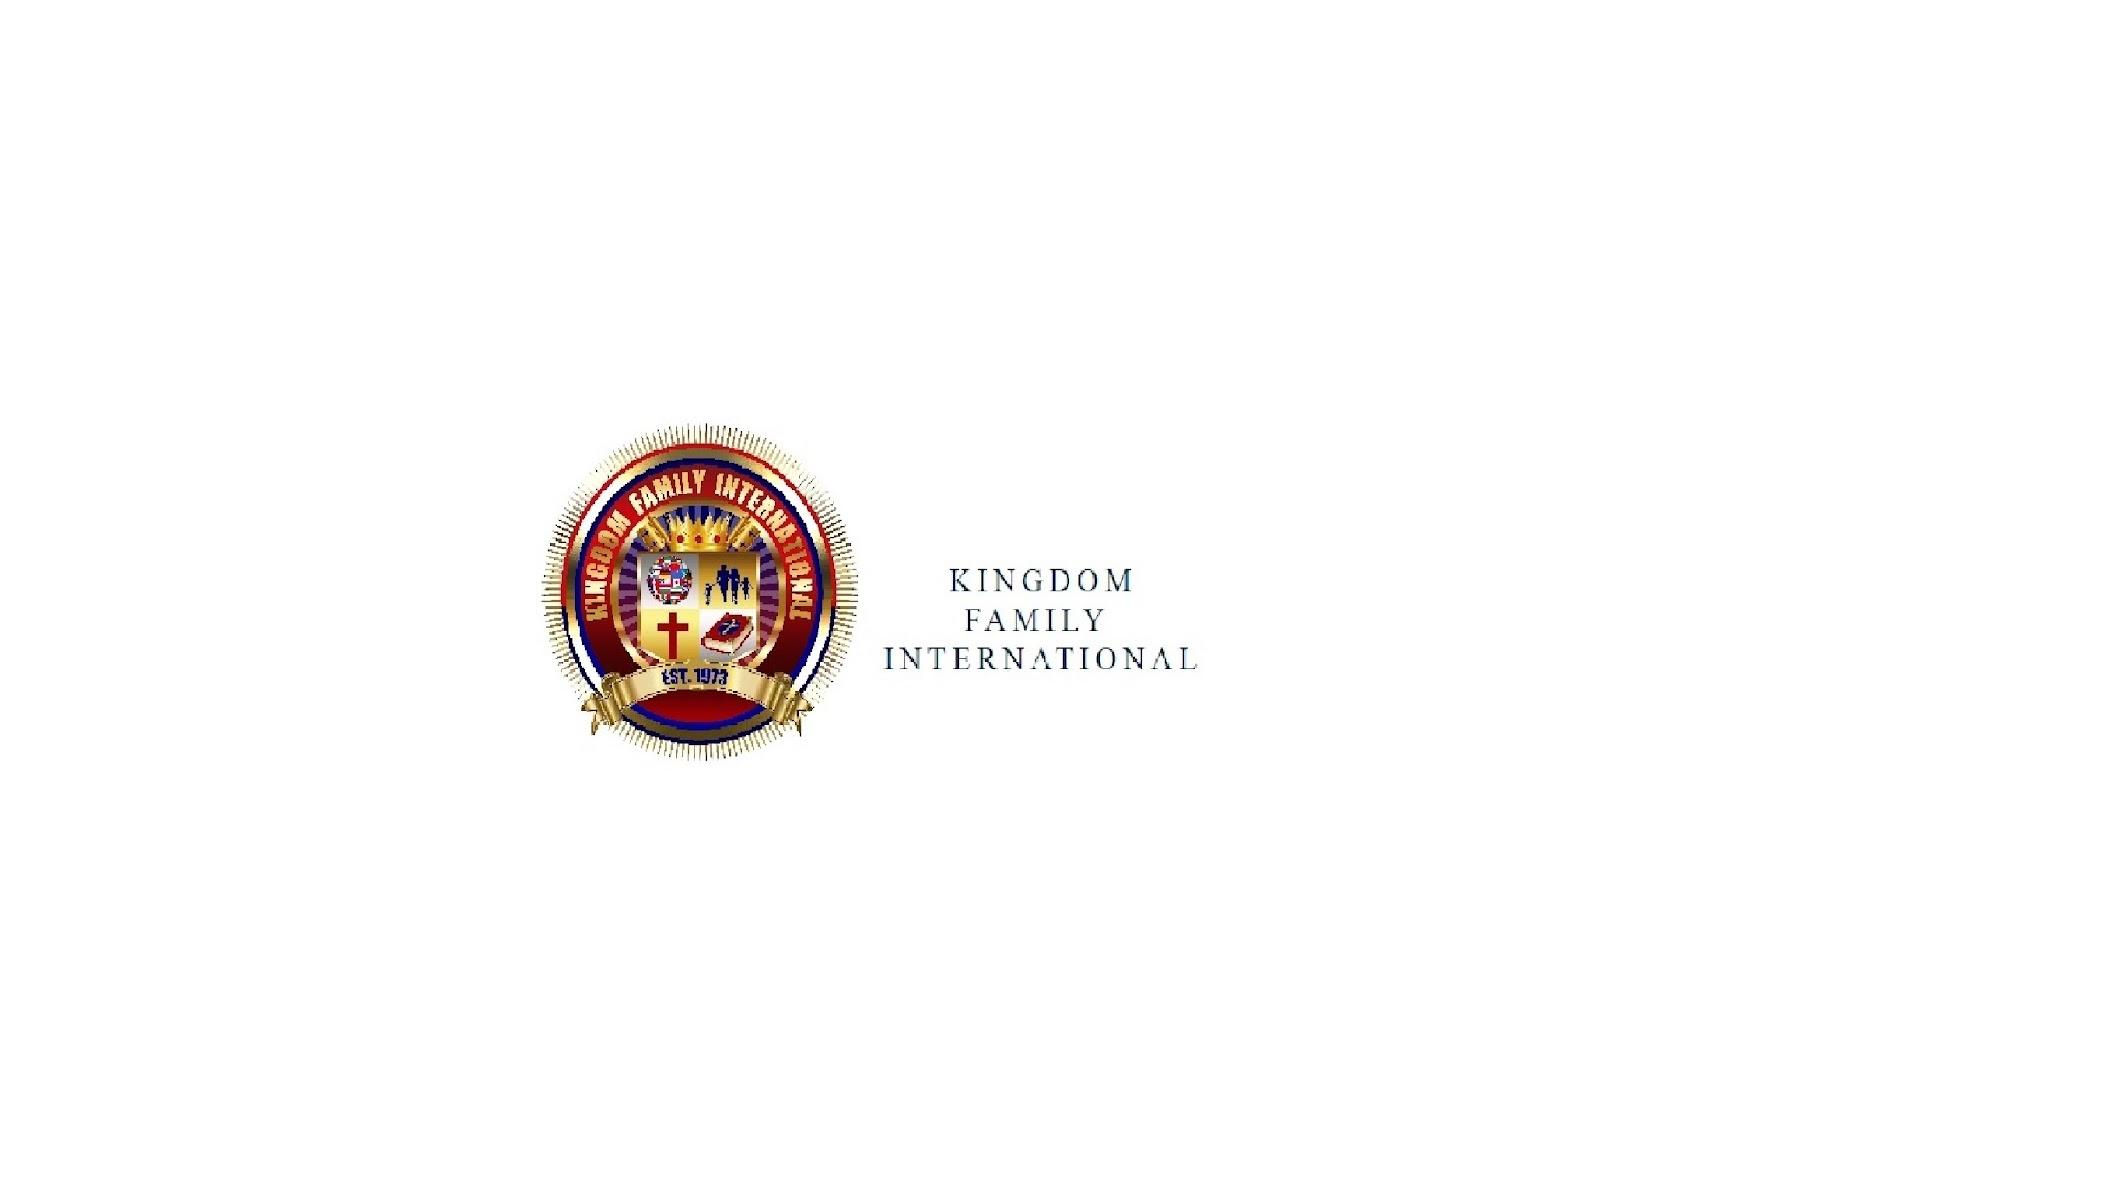 Kingdom Family International